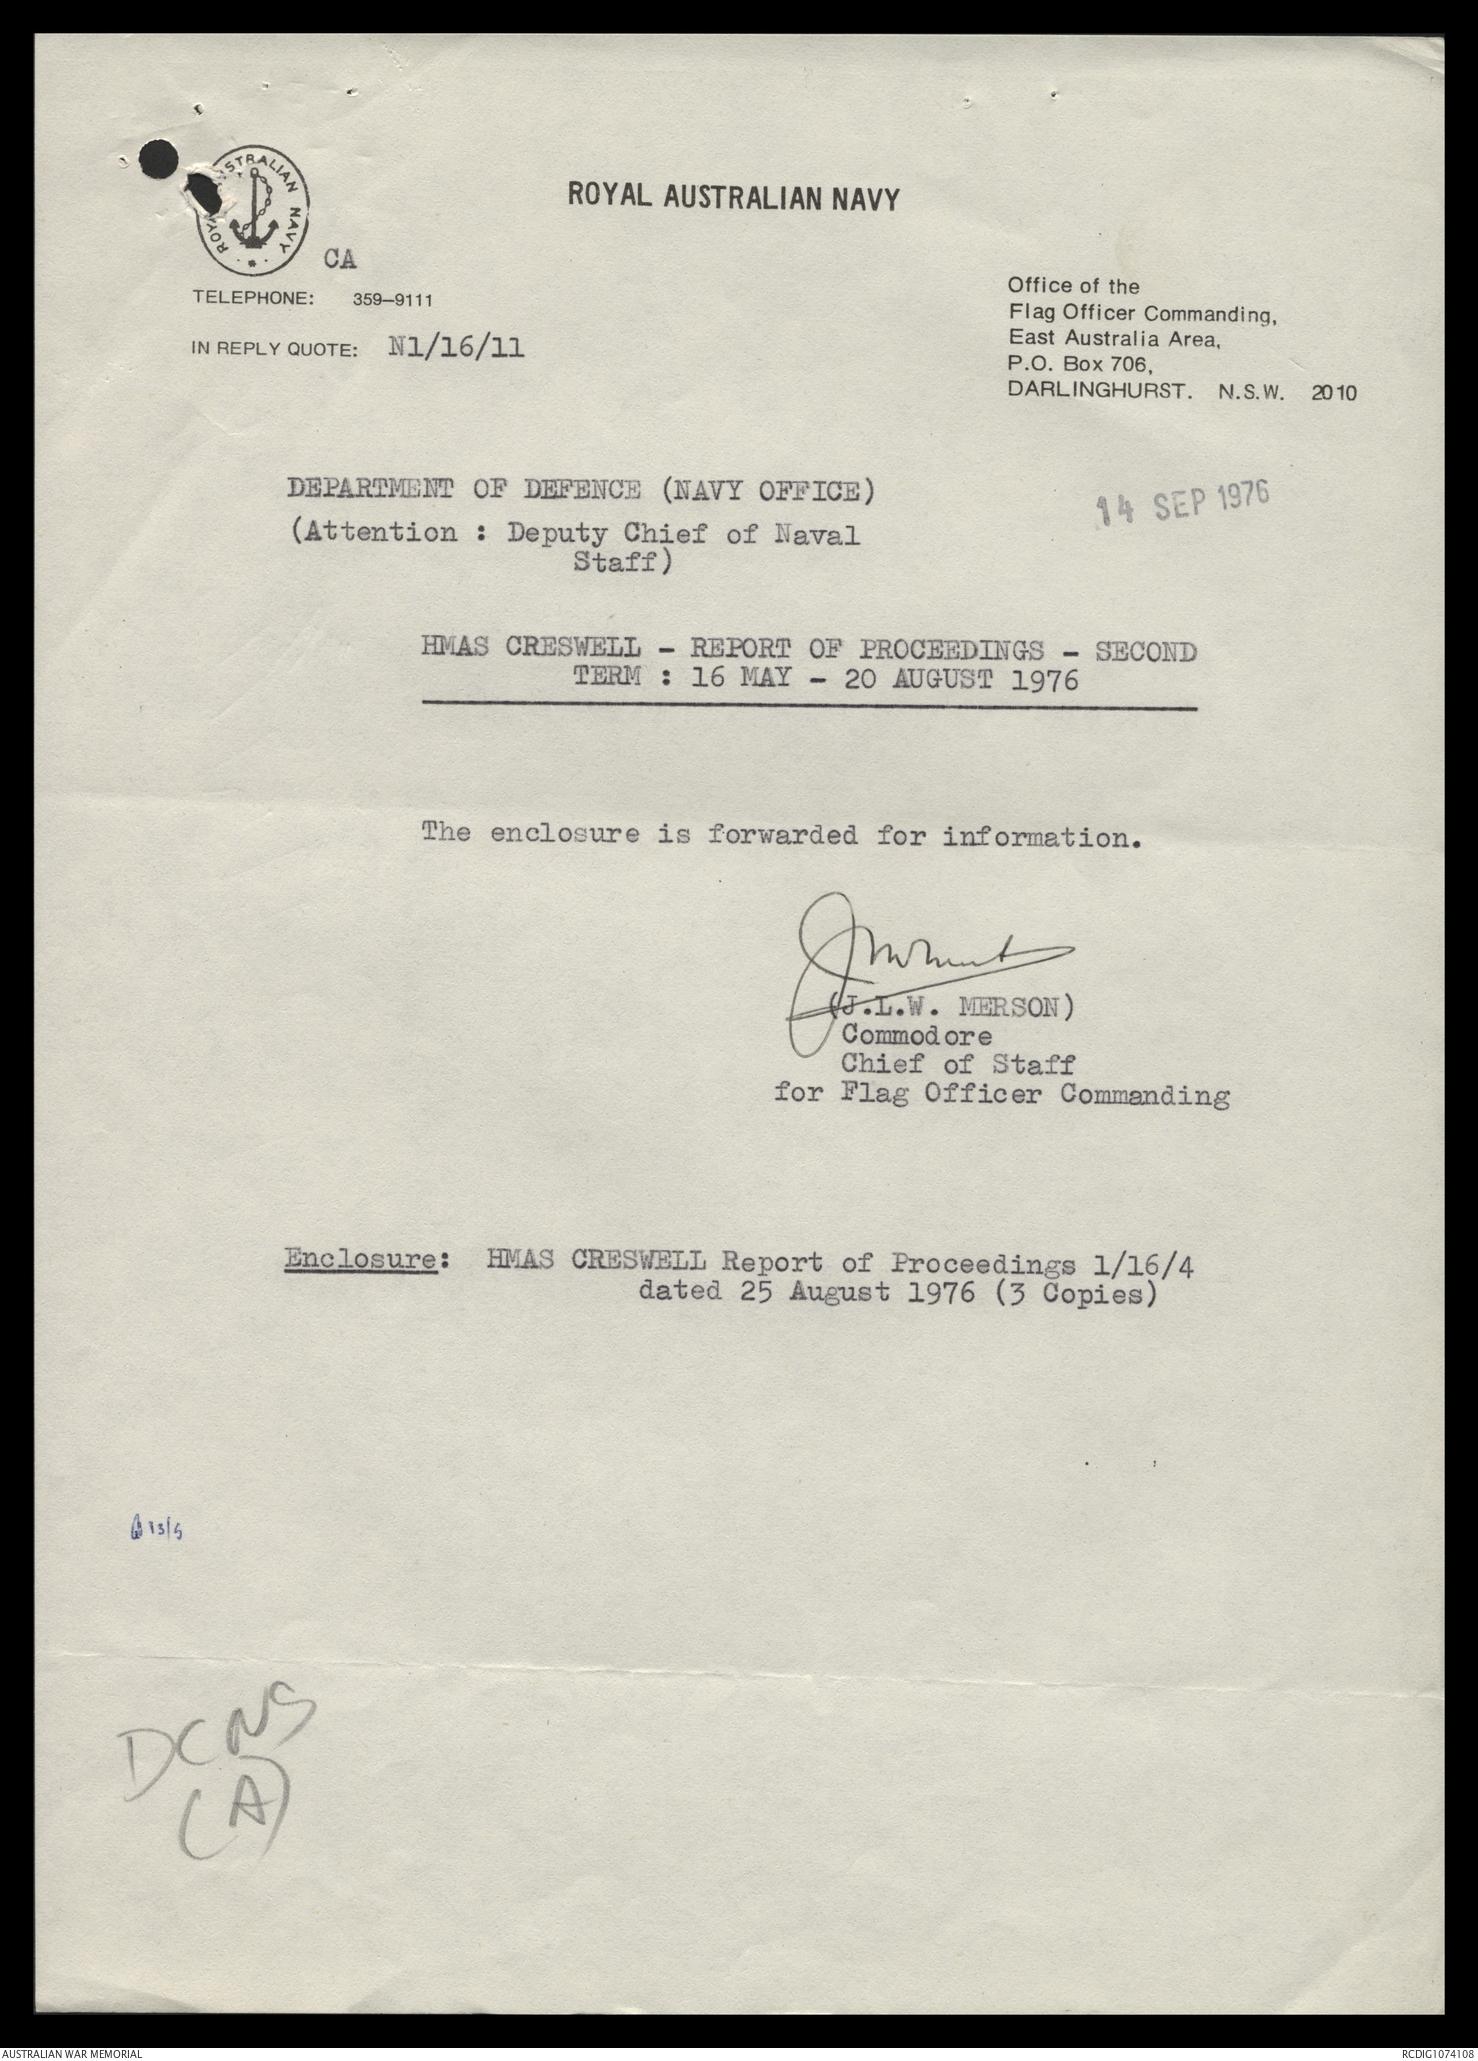 AWM78 433/7 - December 1975 - December 1976   The Australian